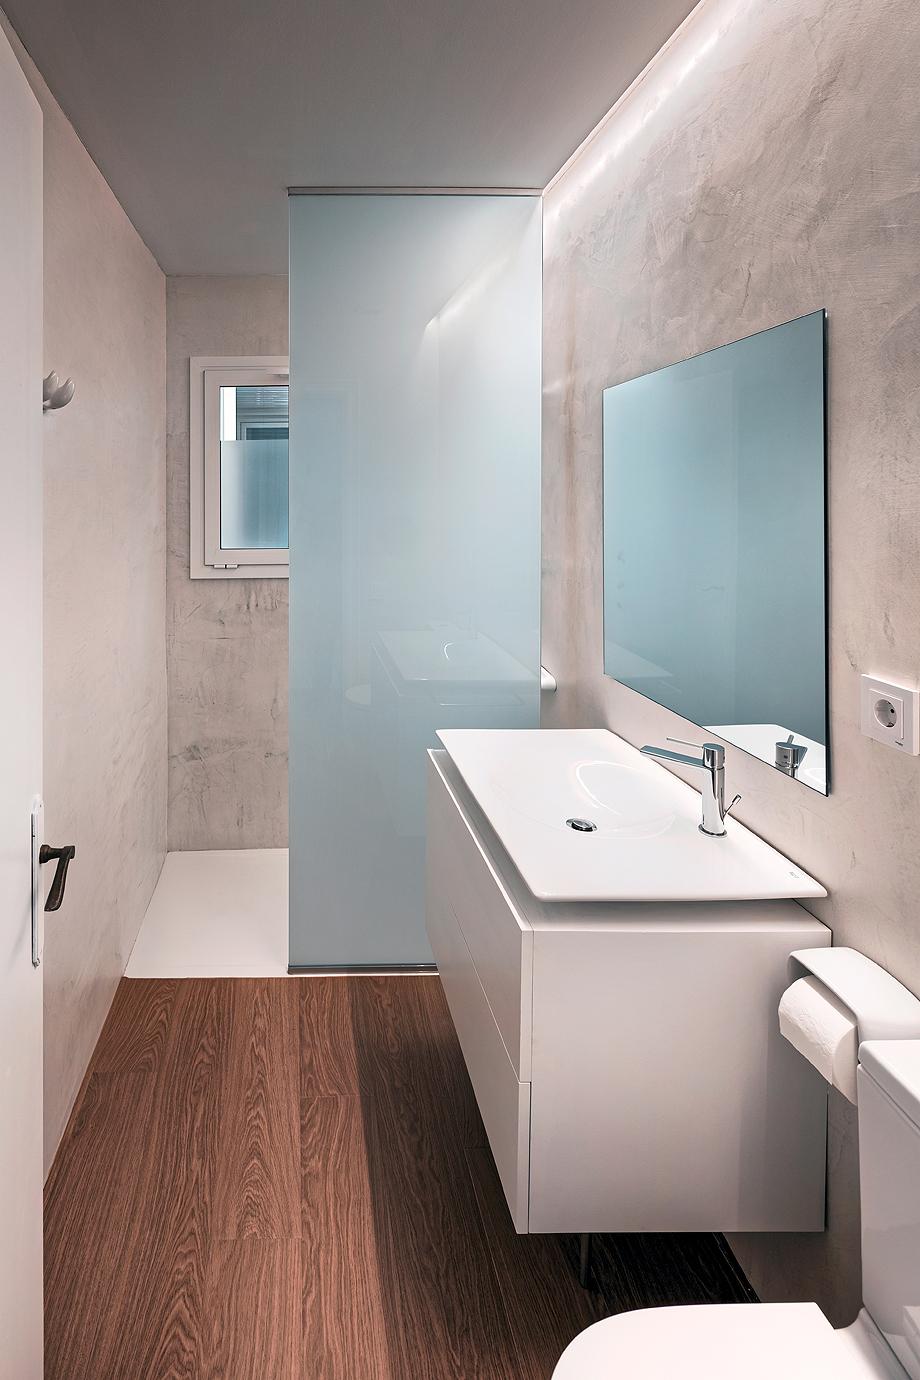 vivienda de alquiler diseño low cost agusti costa (13)